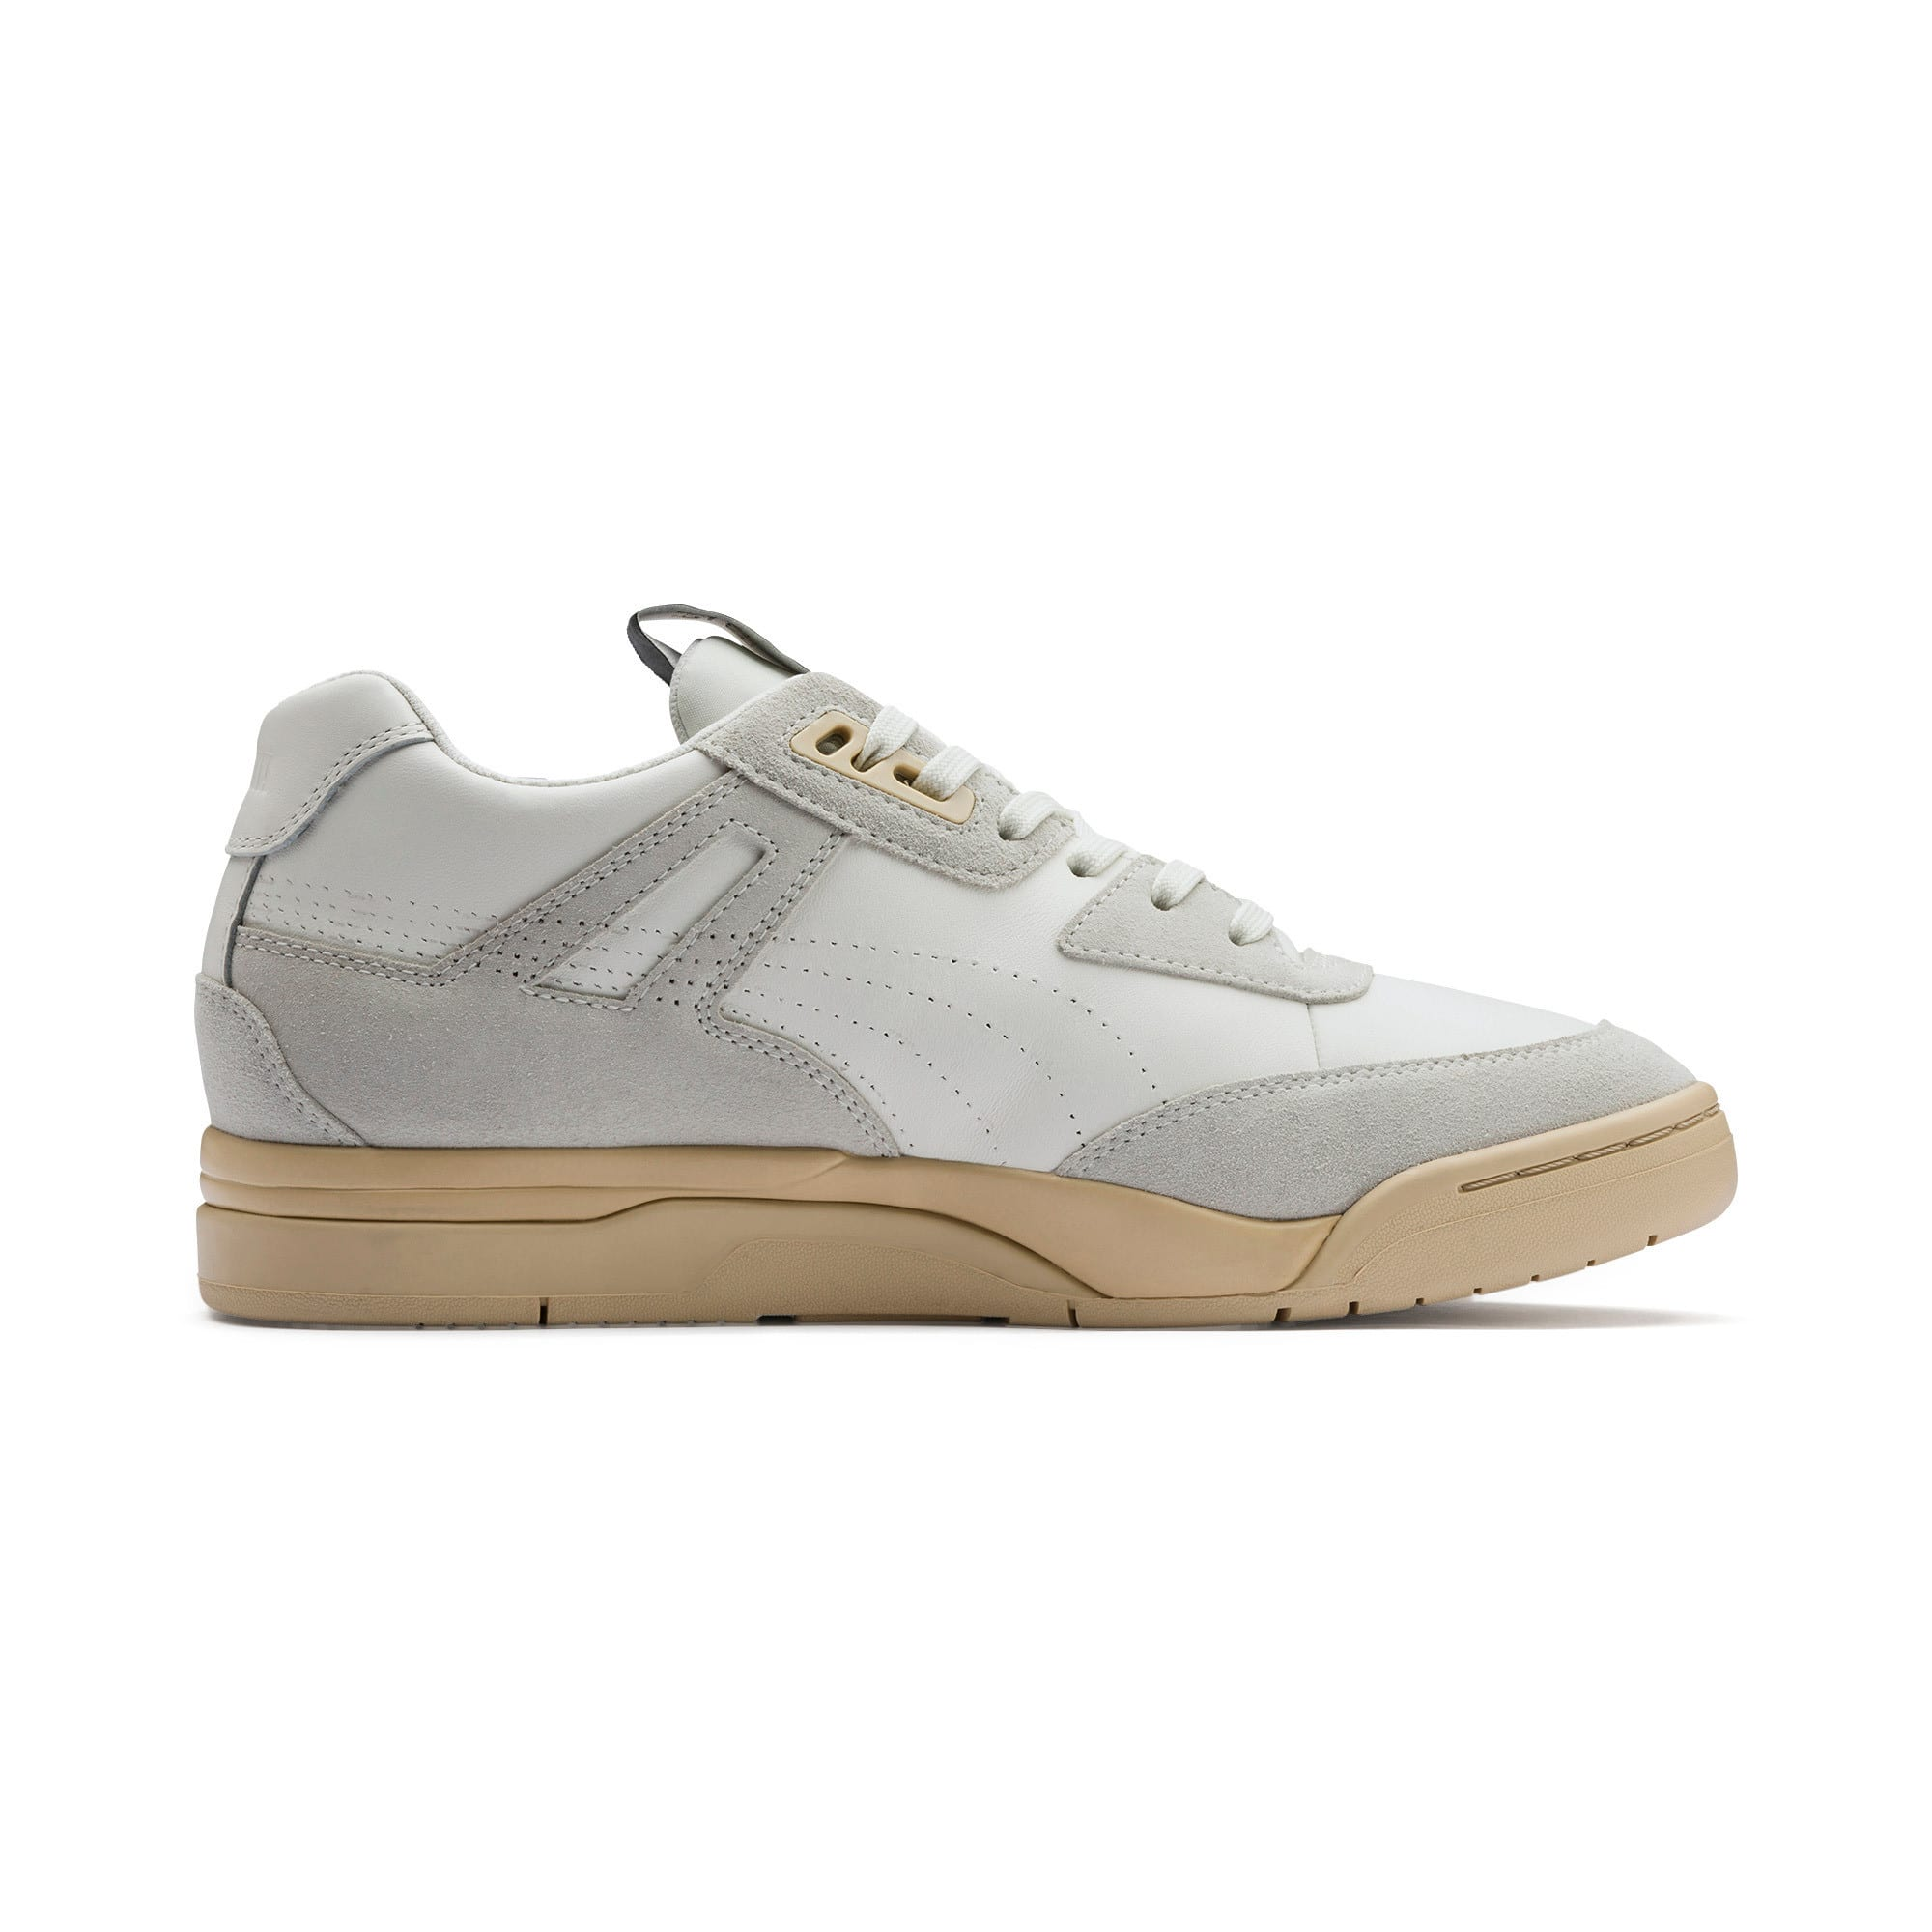 Thumbnail 5 of PUMA x RHUDE Palace Guard Sneakers, Star White-WINDCHIME, medium